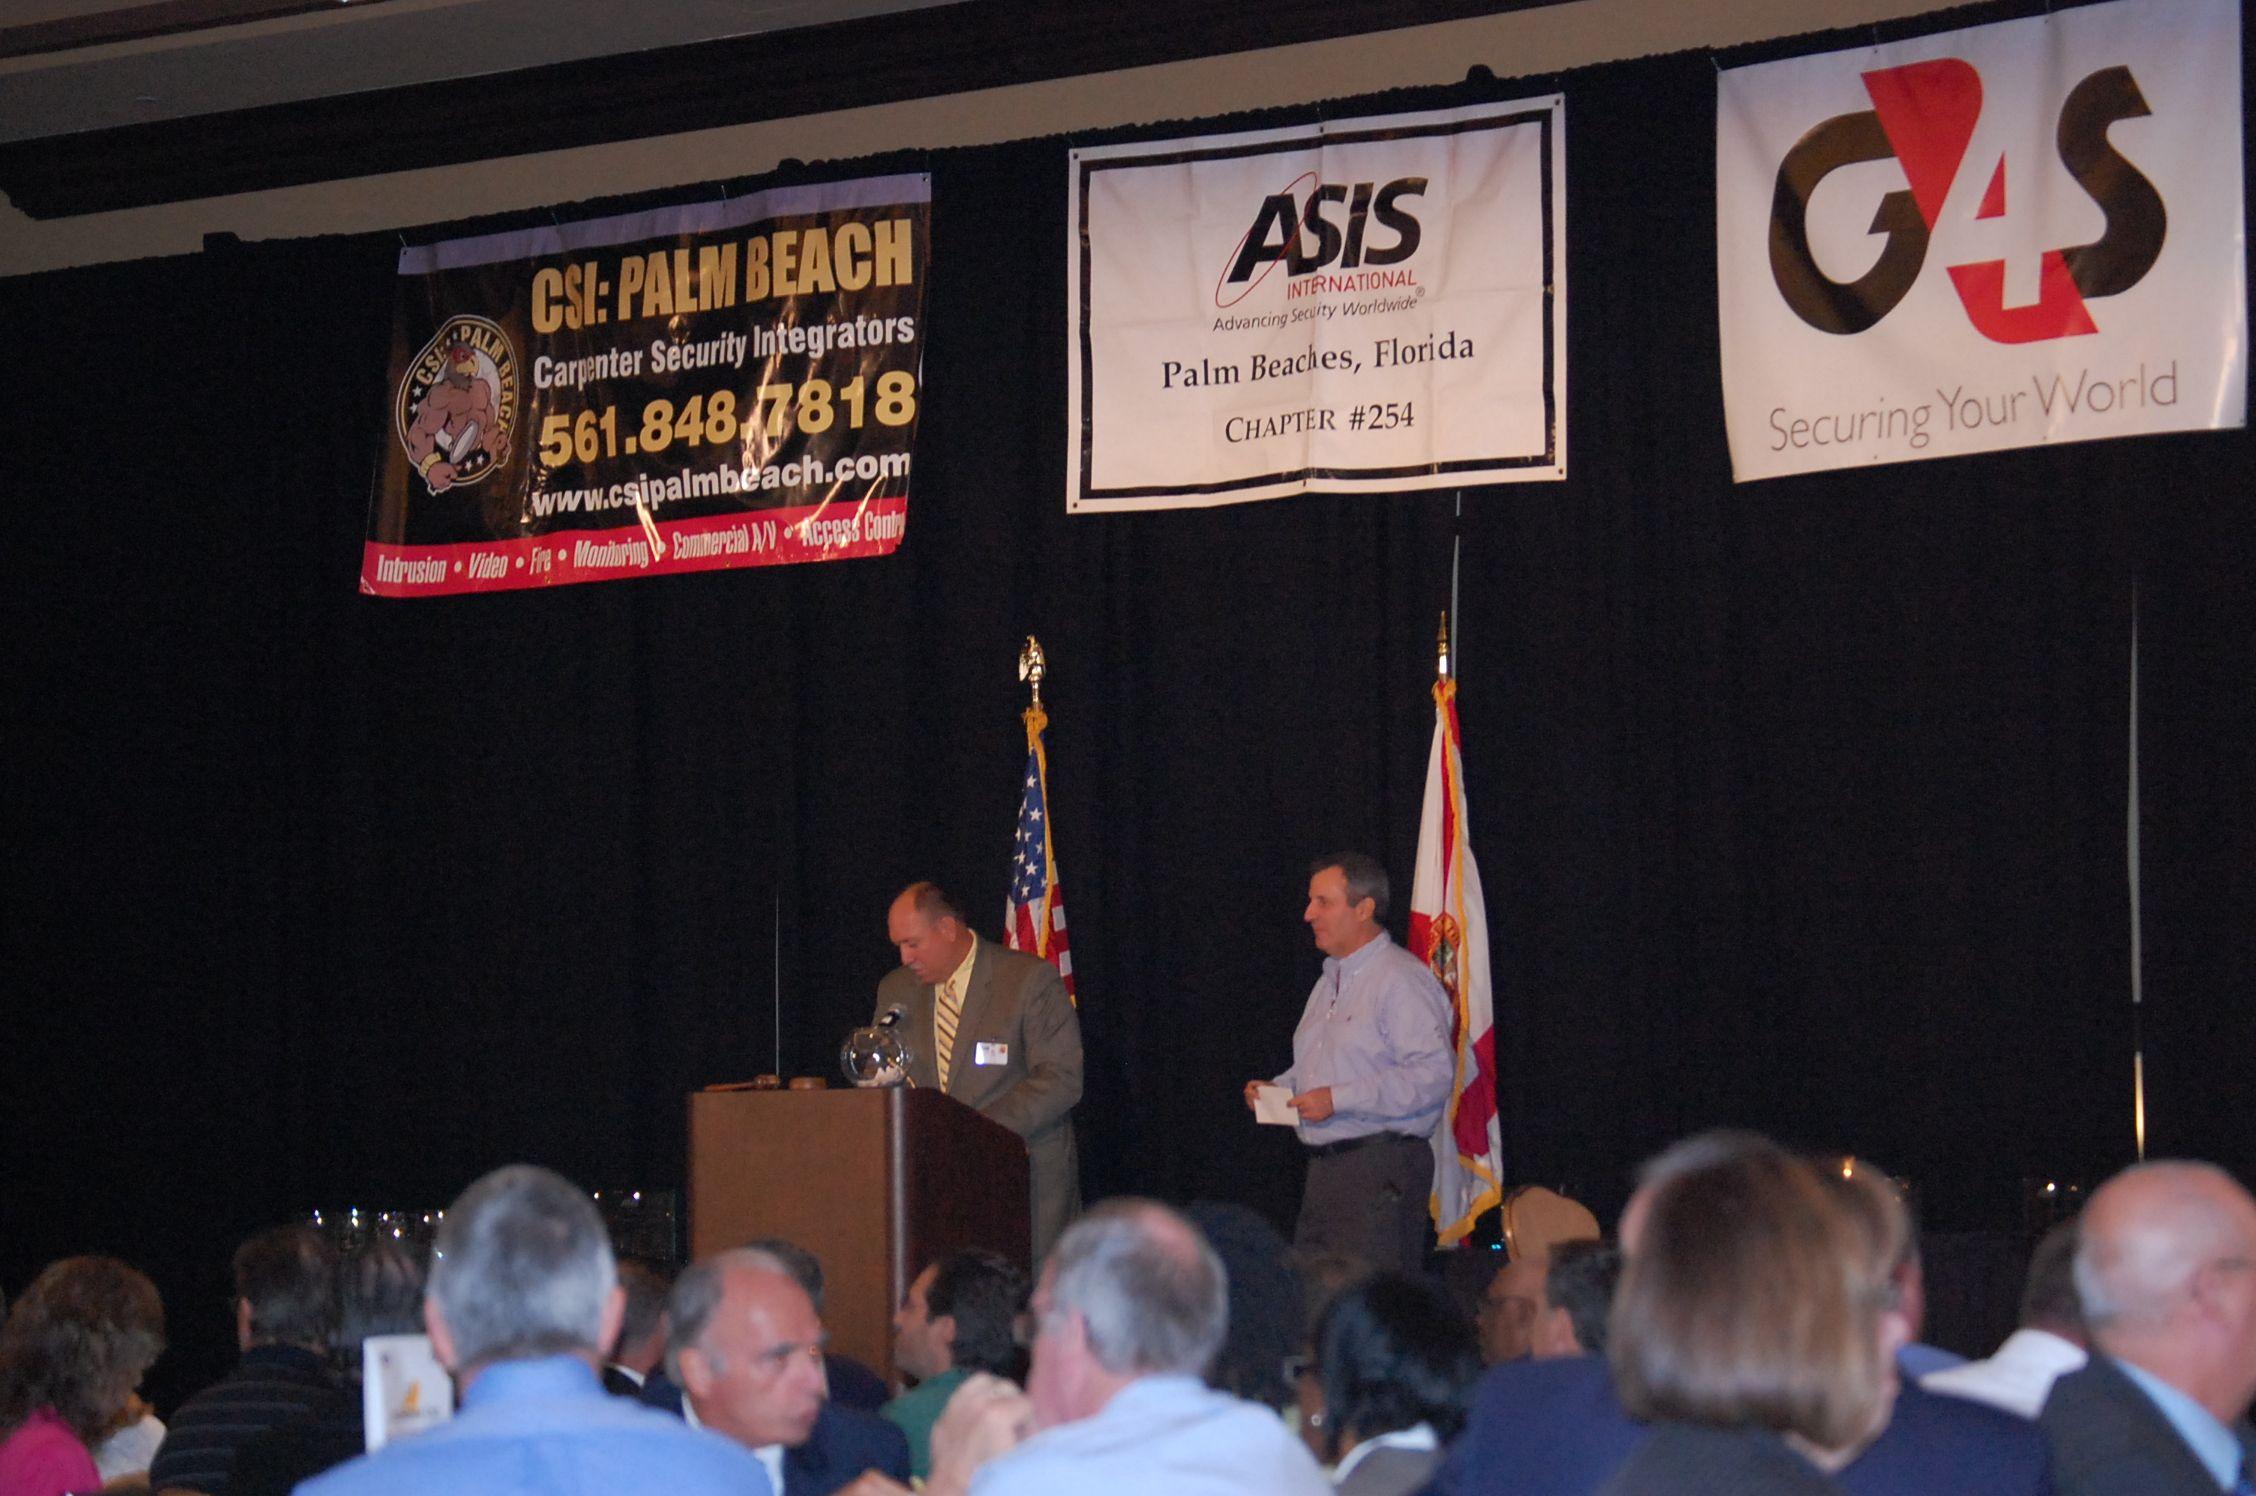 2012 ASIS Law Enforcement Awards Asis Awards